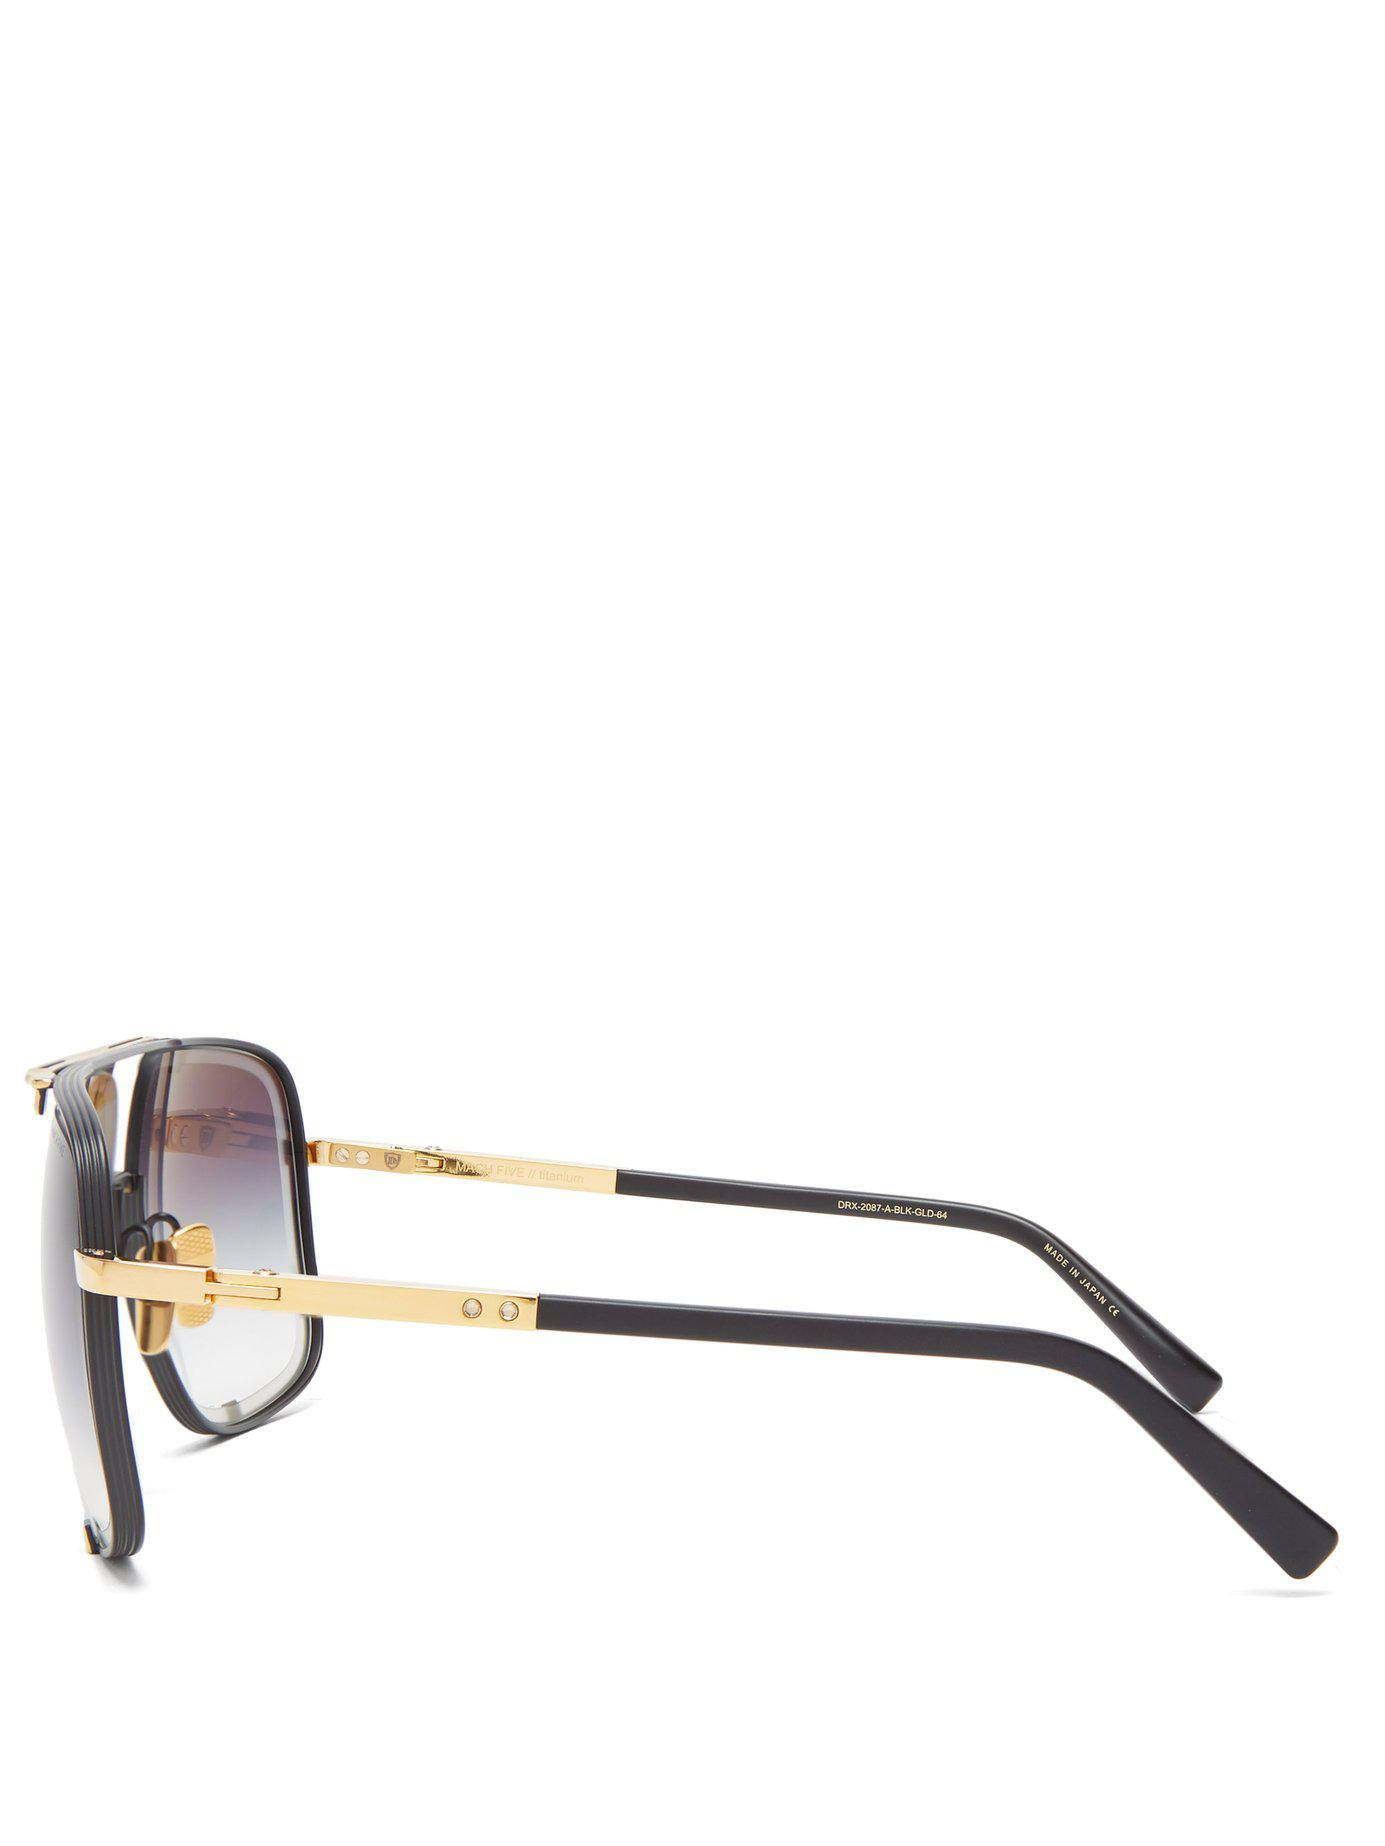 d8c12c2ab088 Lyst - Dita Eyewear Machn Five Gold-plated Titanium Sunglasses in ...